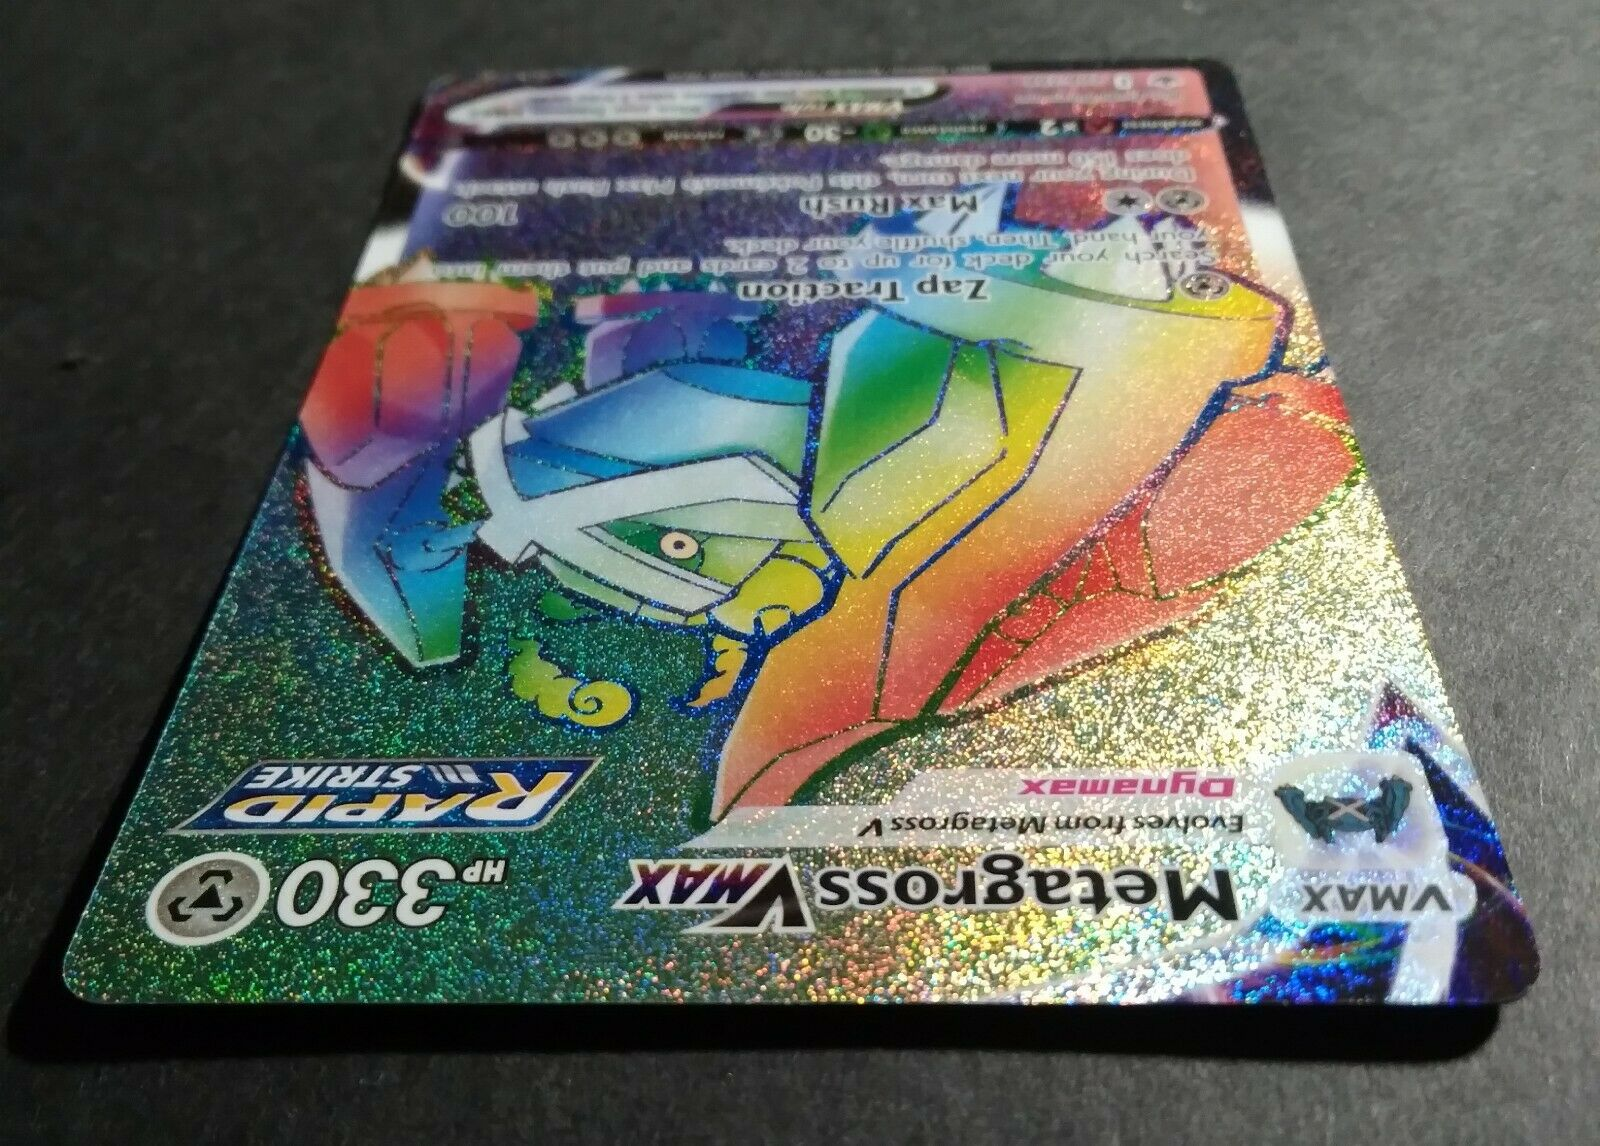 Pokemon TCG: Chilling Reign- Metagross VMAX 208/198 *Rainbow Secret Rare* - Image 2